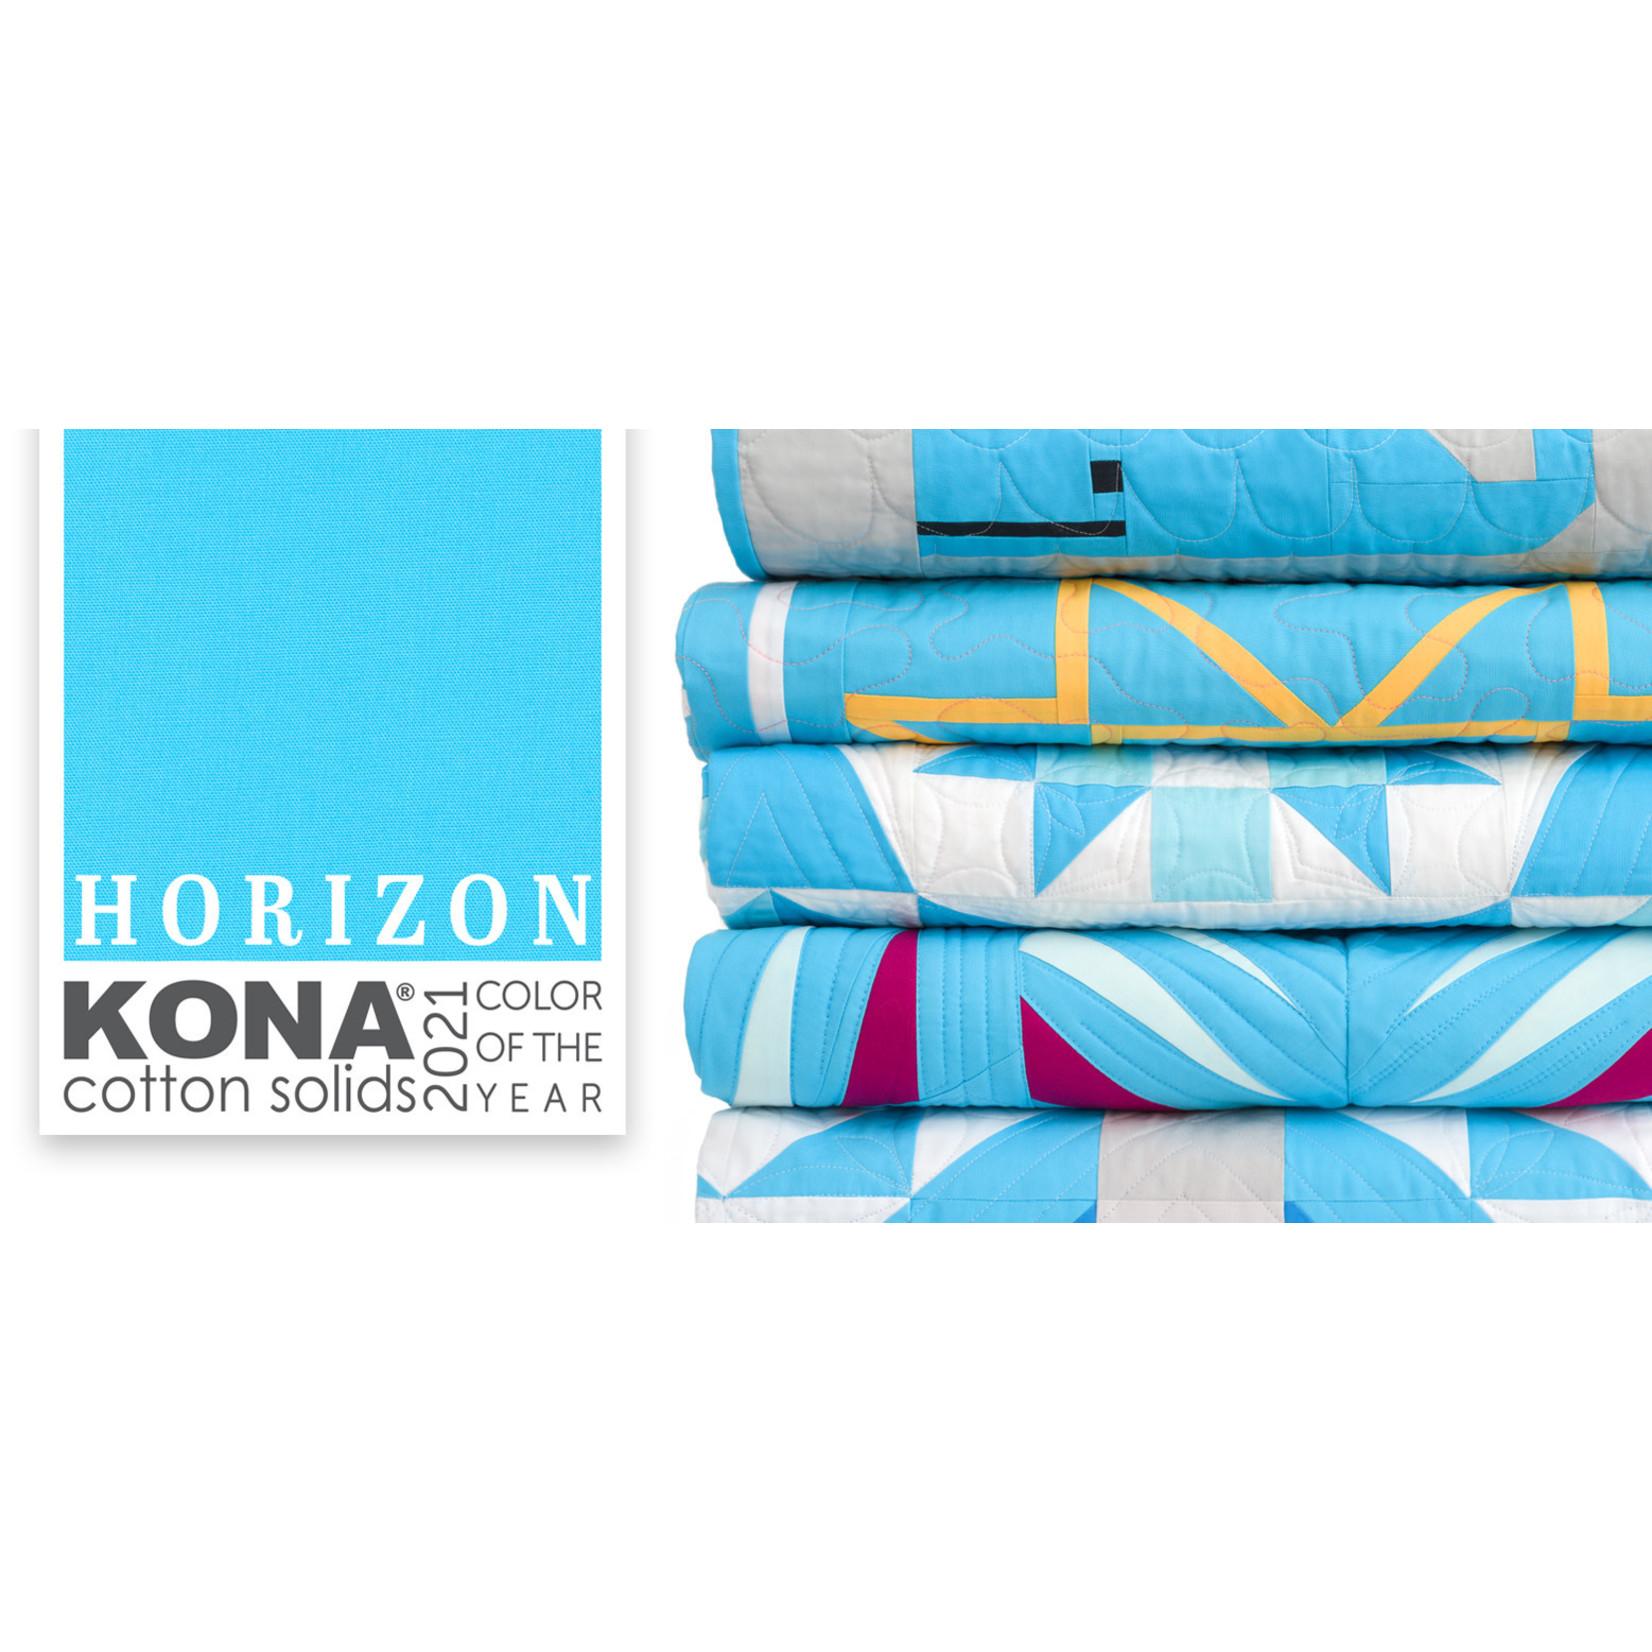 Kona KONA  K001-1914 HORIZON, PER CM OR $14/M